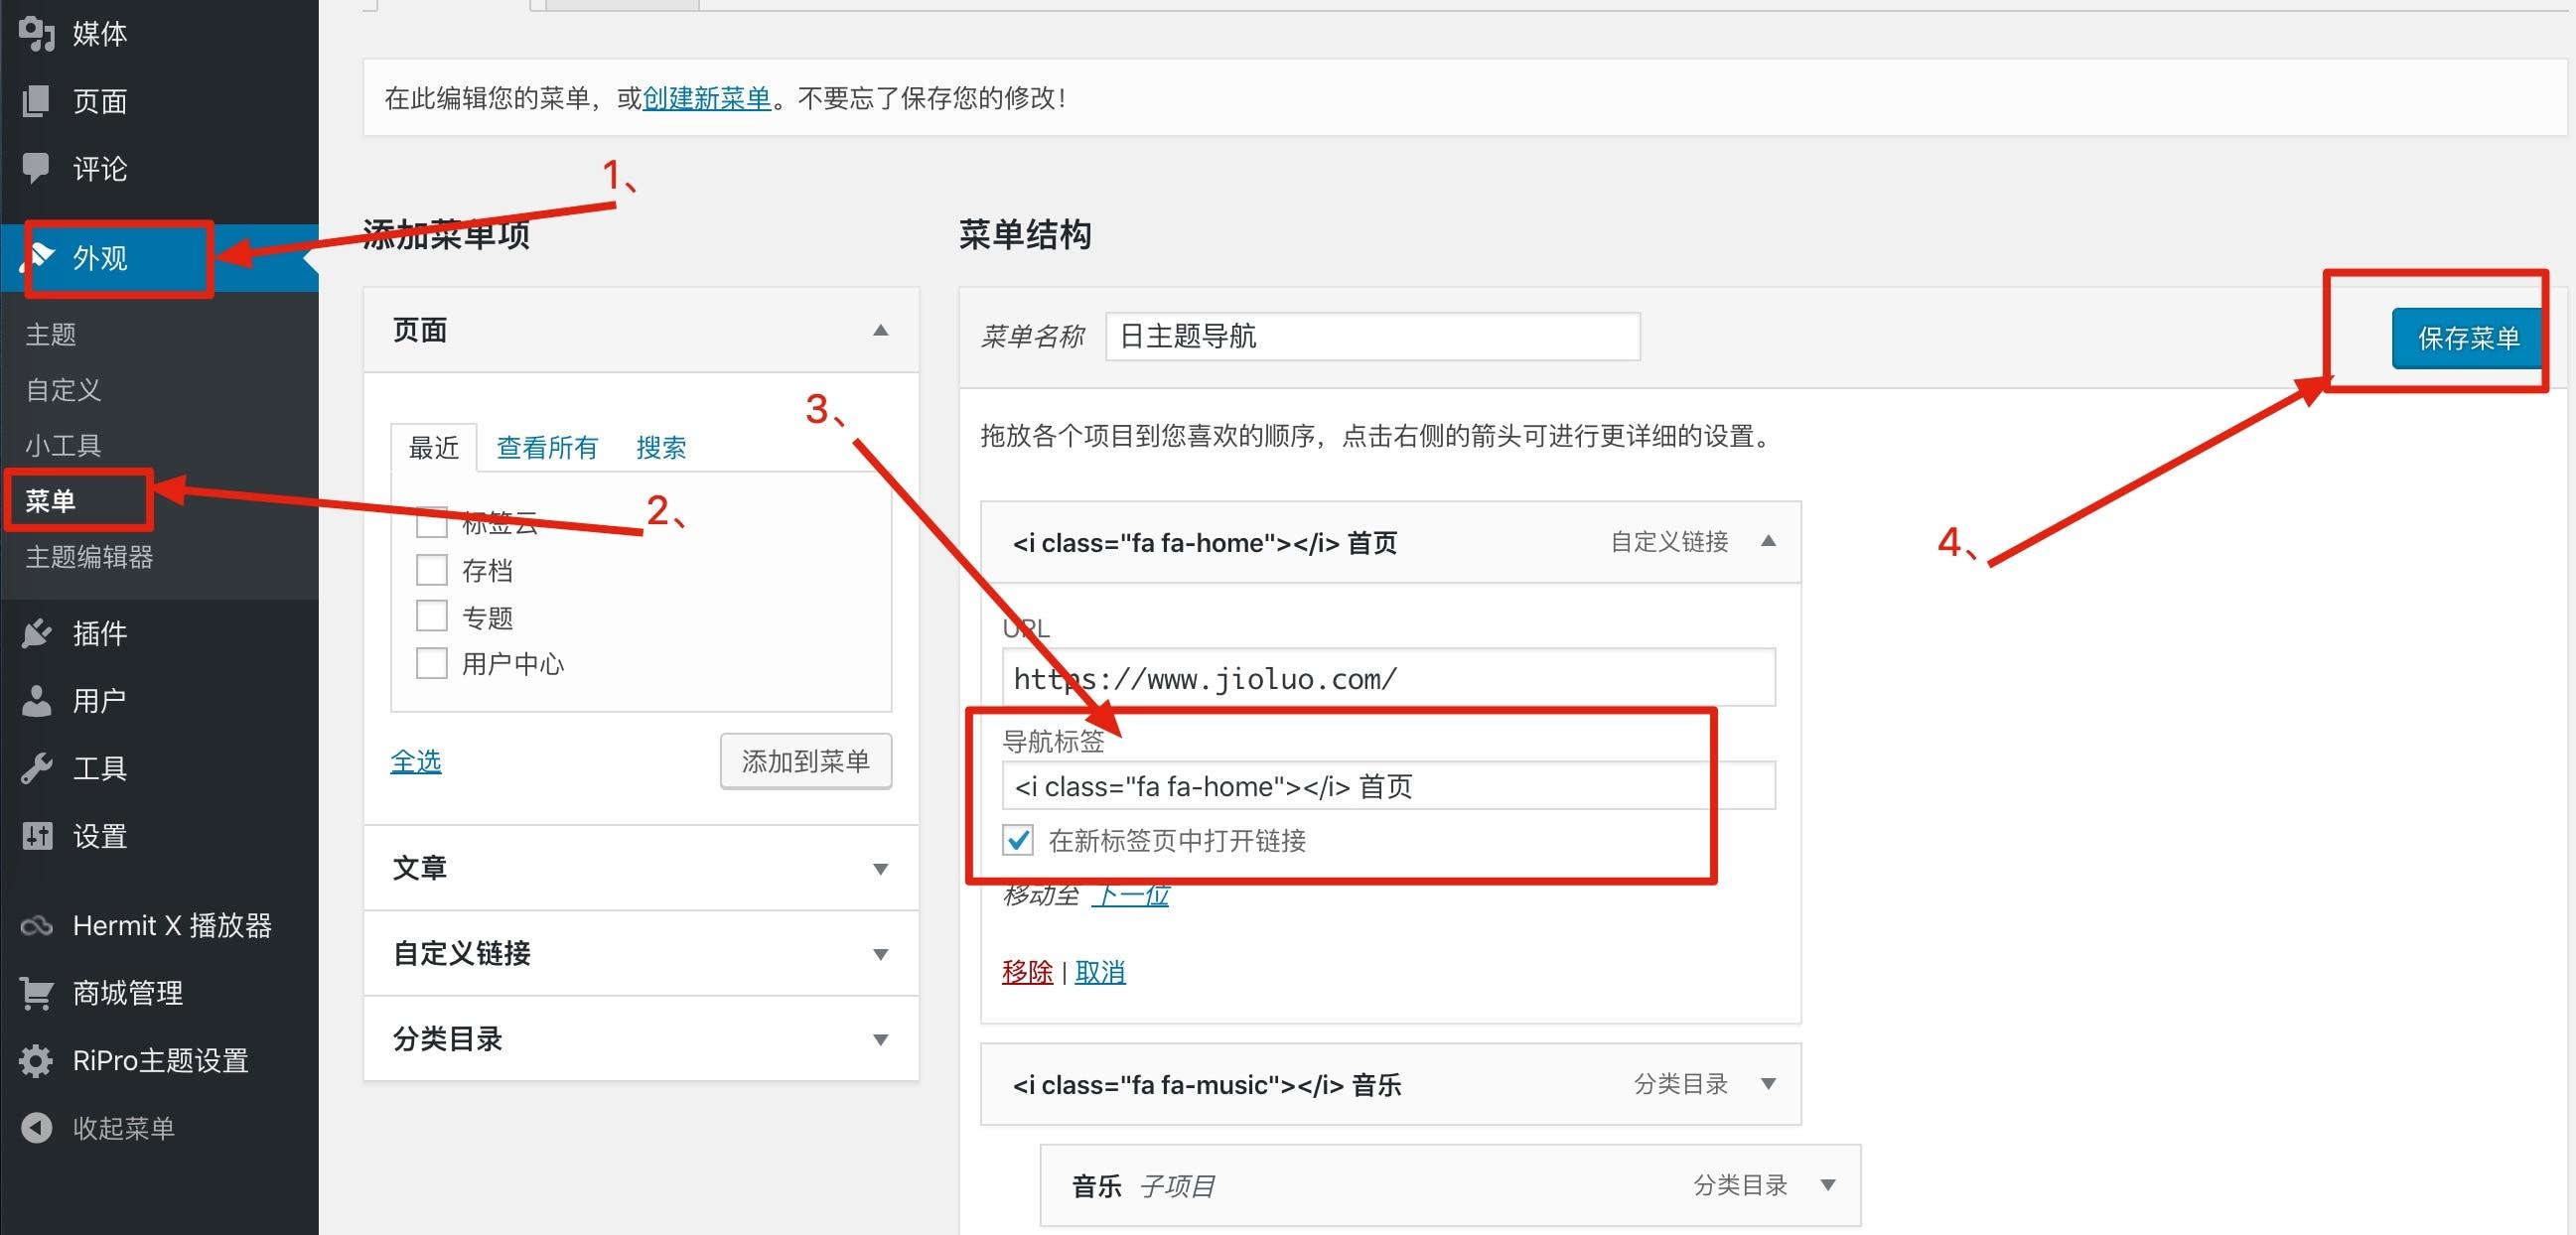 H73a465444ceb4e4081547a112a19be2c9 - WordPress主题添加菜单图标图文教程